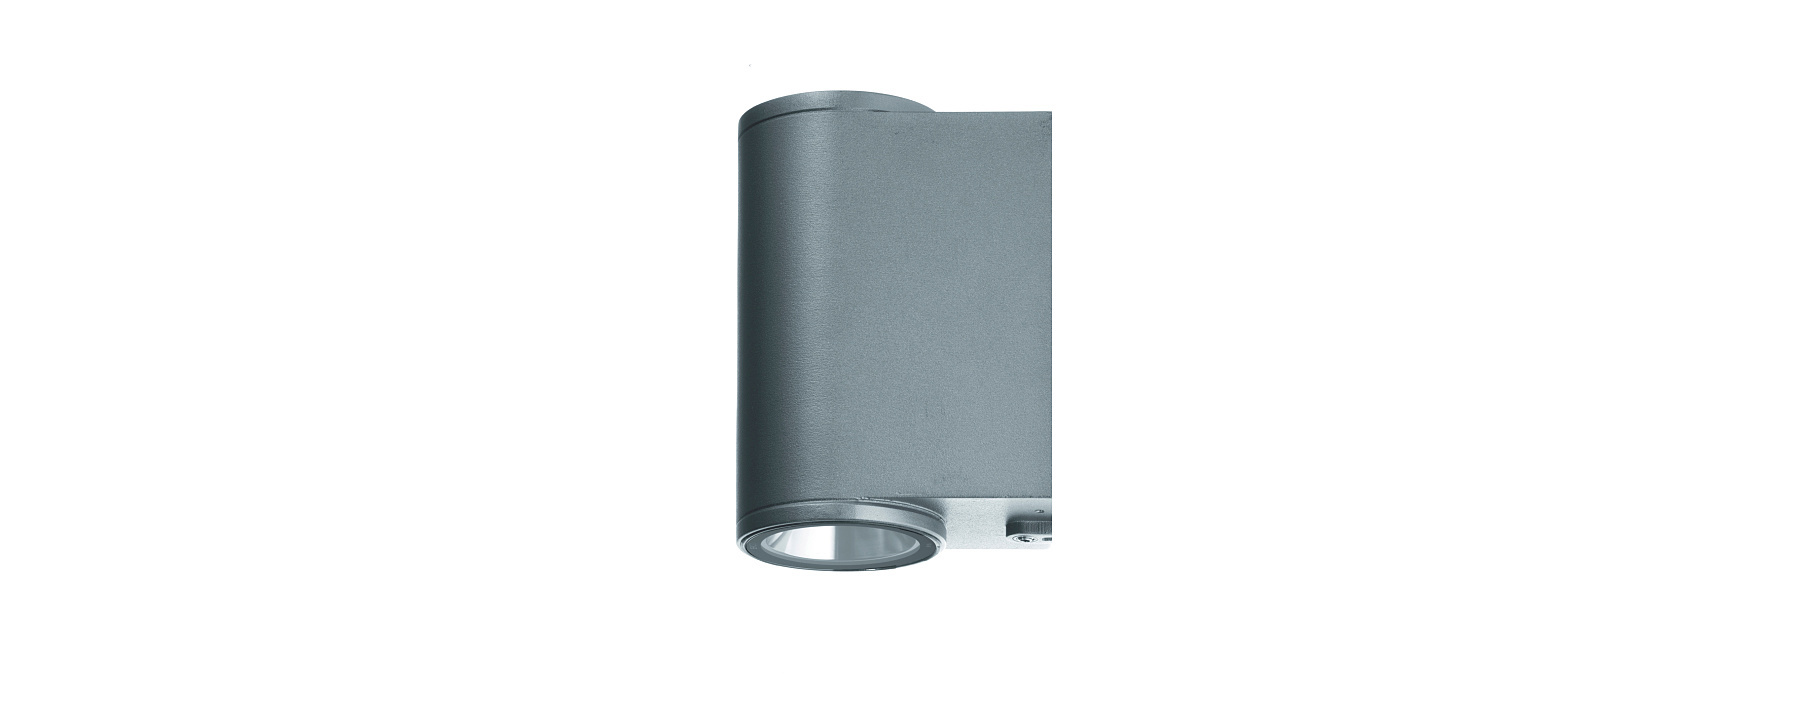 ext rieur appareils d 39 clairage de fa ade cylinder. Black Bedroom Furniture Sets. Home Design Ideas